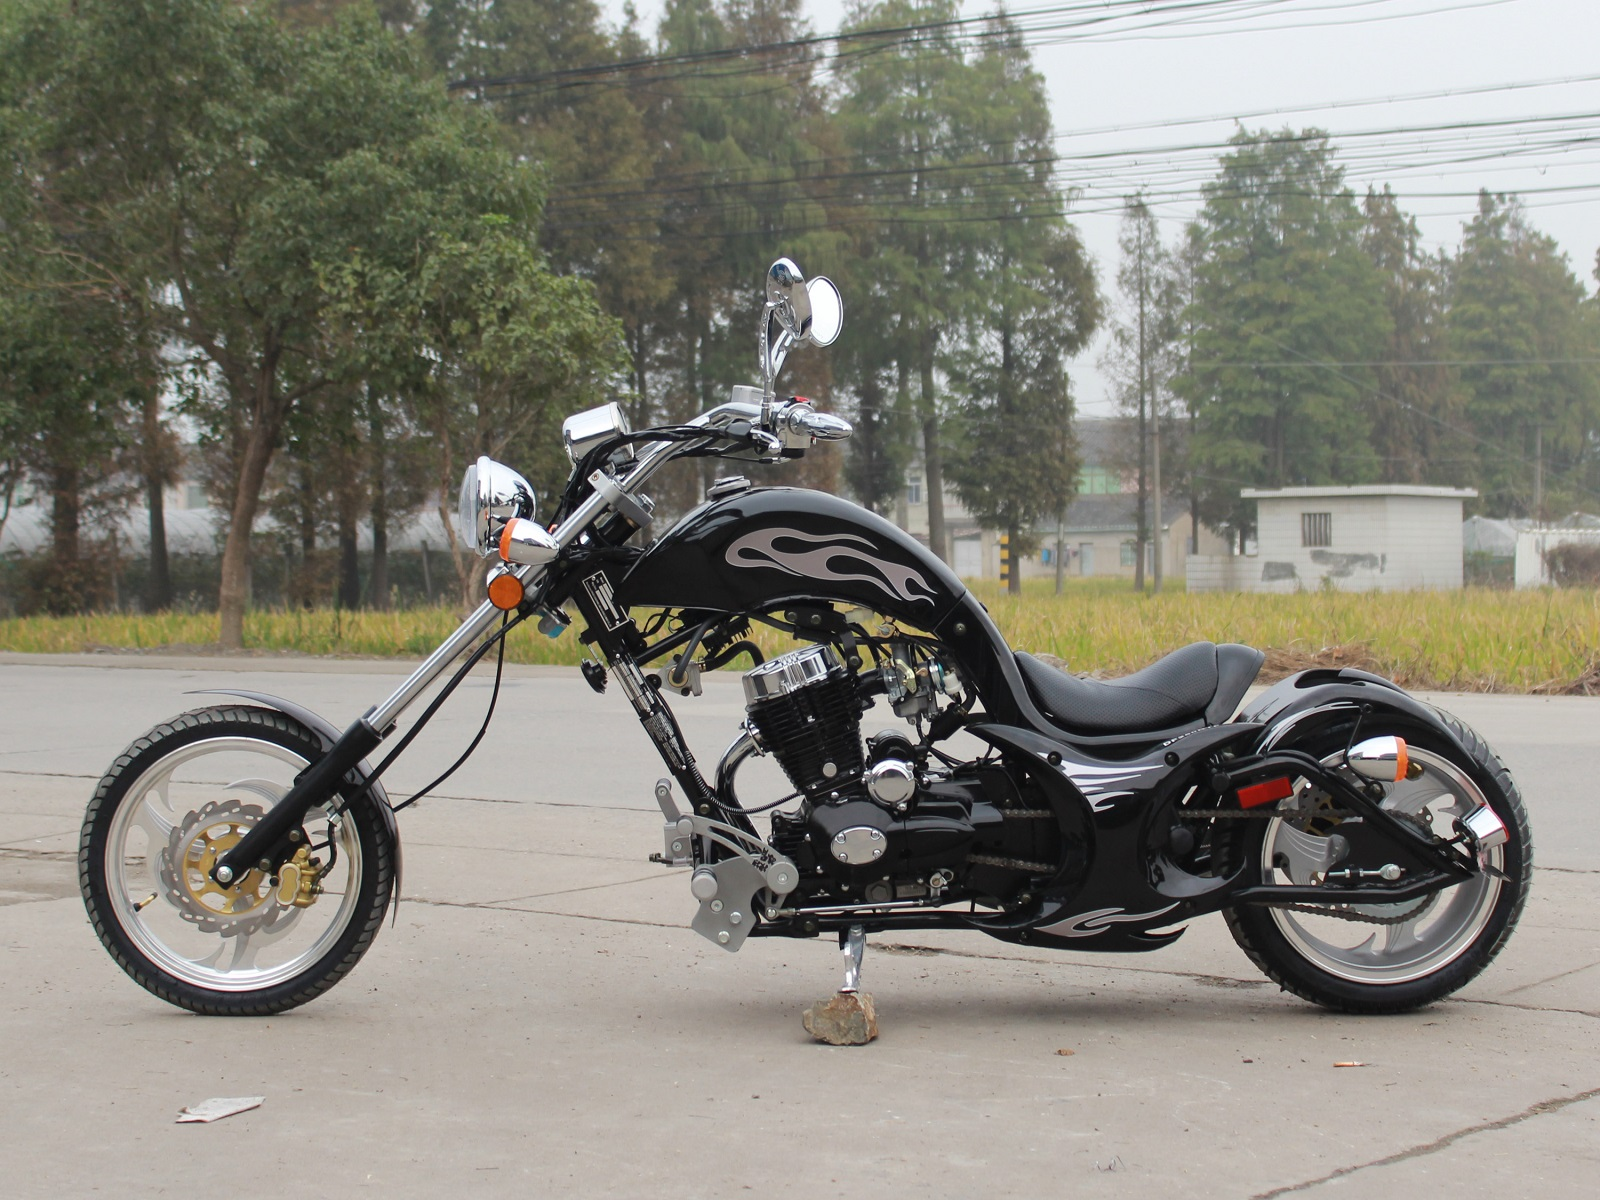 free shippin premium villain 250cc mini chopper motorcycle. Black Bedroom Furniture Sets. Home Design Ideas